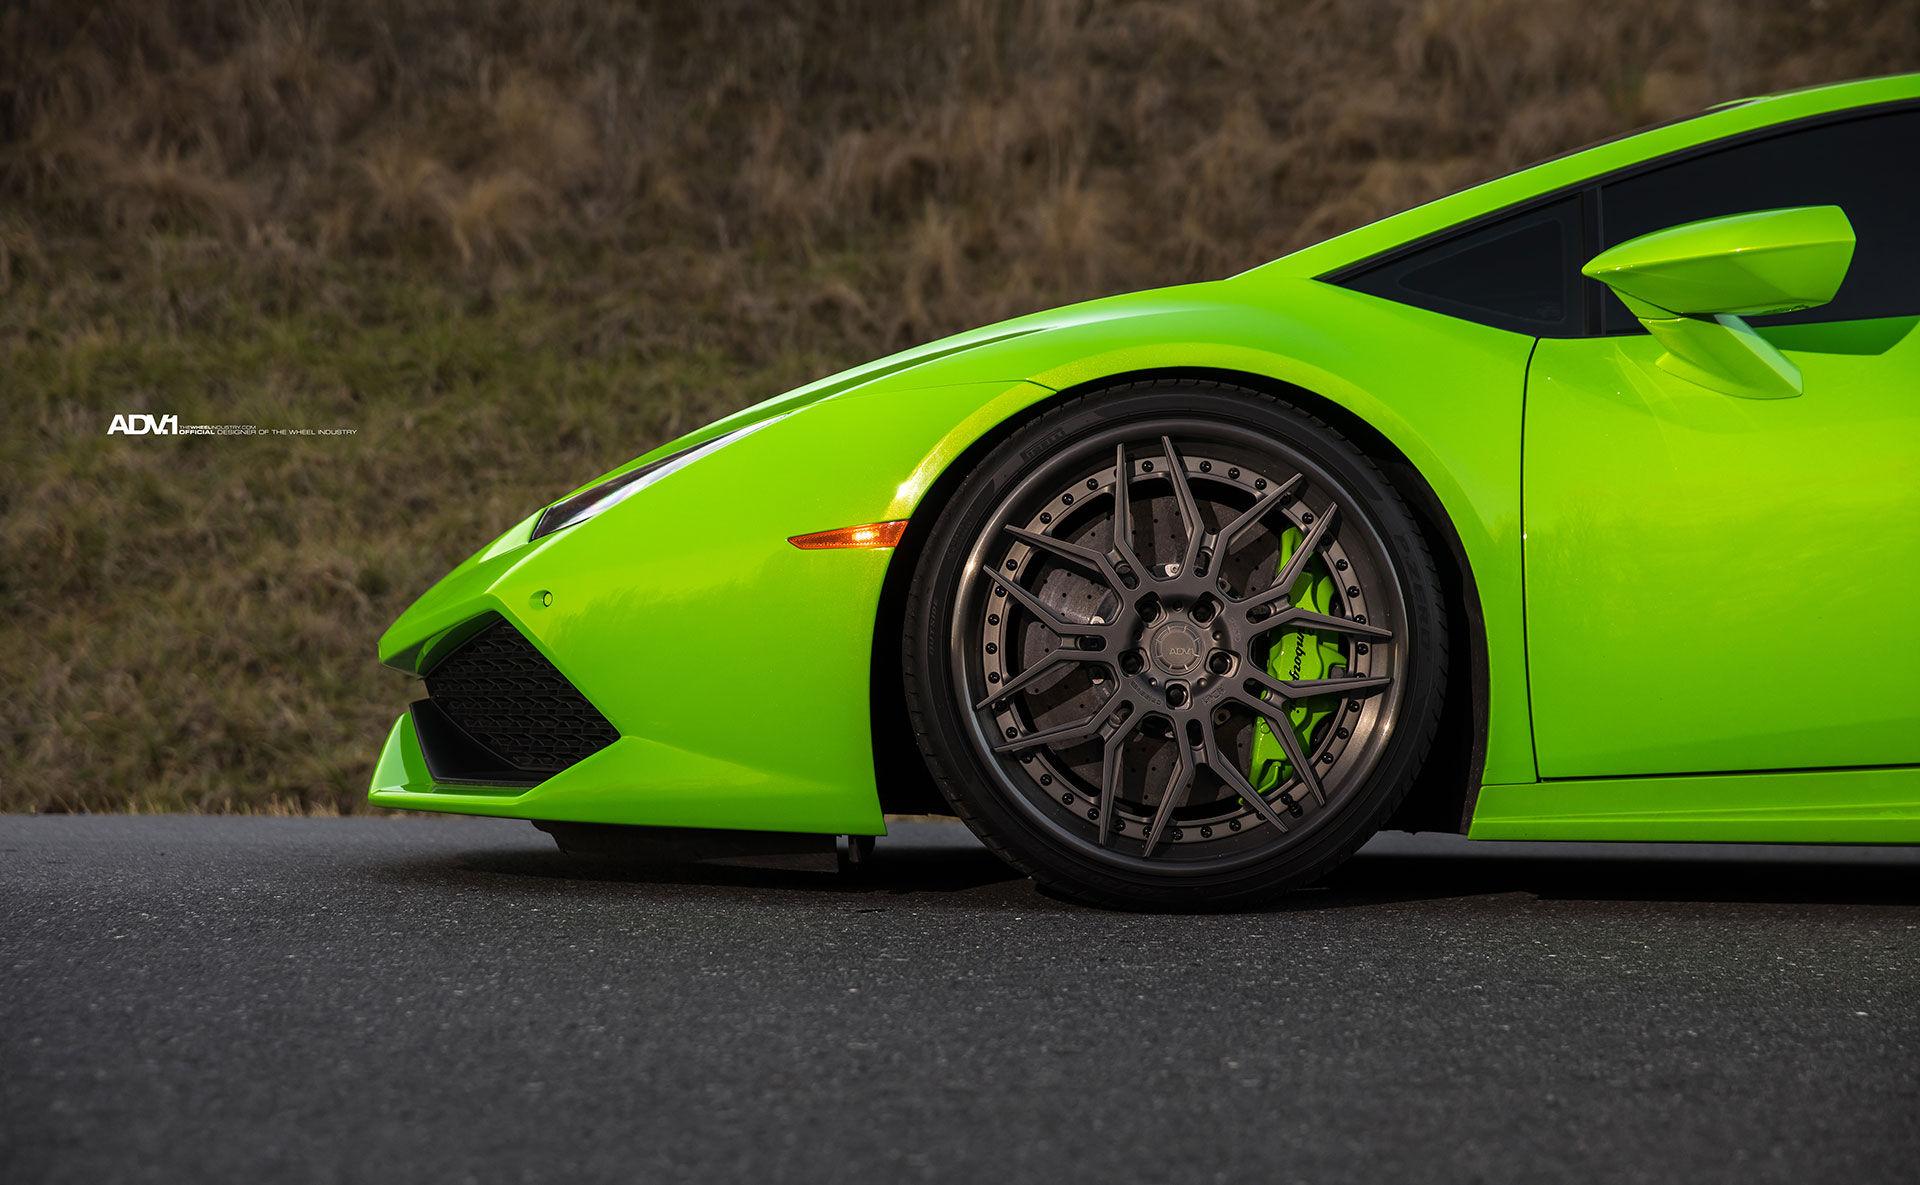 Lamborghini Huracan | Verde Mantis Green Lamborghini Huracan LP610-4 - ADV7 Track Spec CS Series